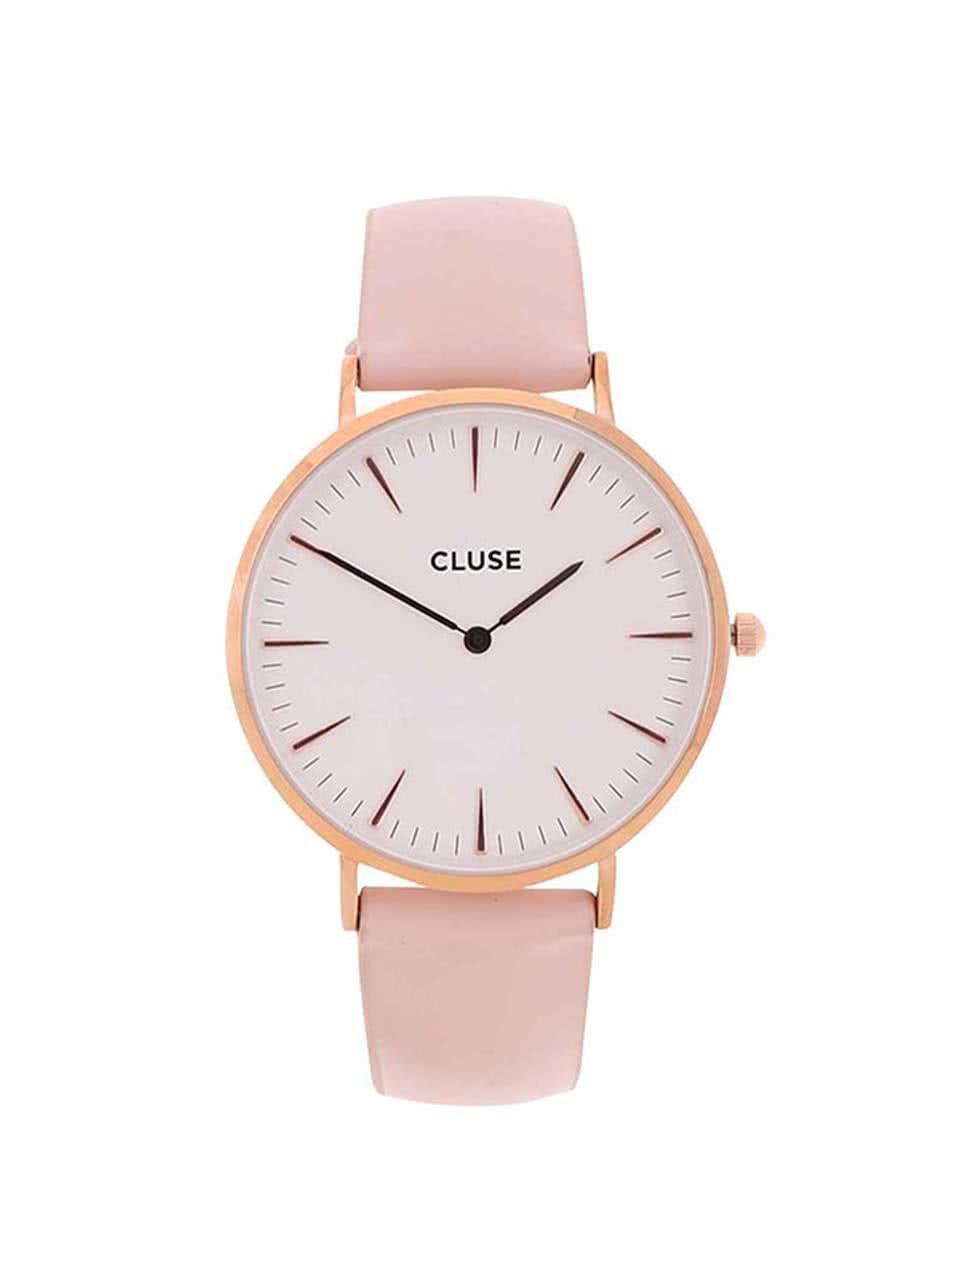 Bílo-růžové dámské kožené hodinky CLUSE La Bohème Rose Gold ... c4dab38de4